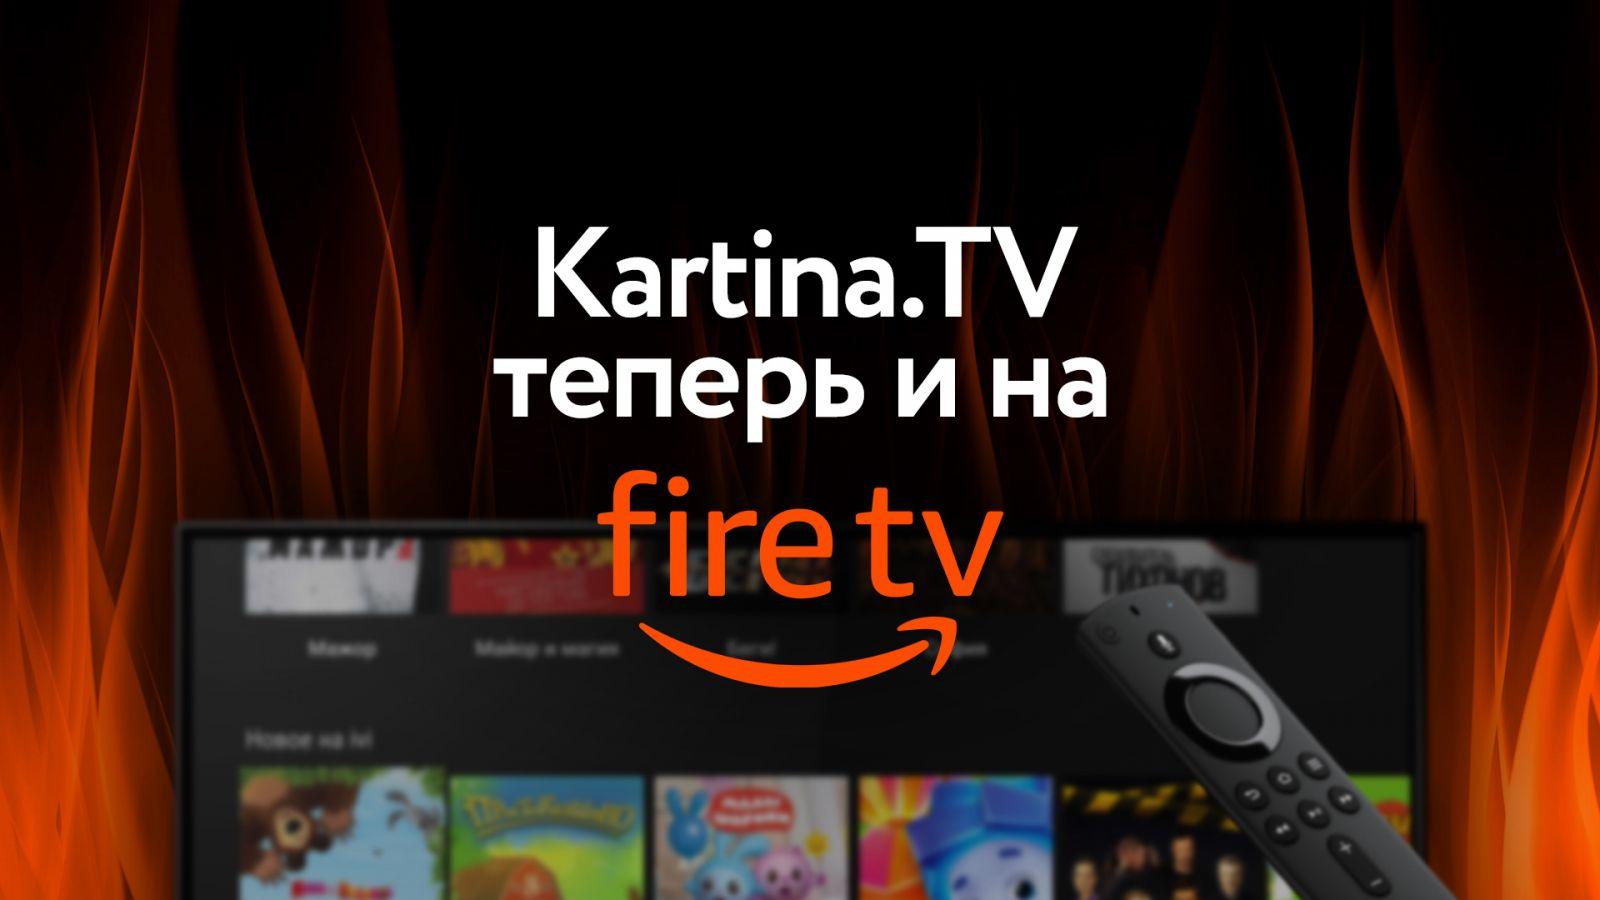 Картина ТВ Fire tv